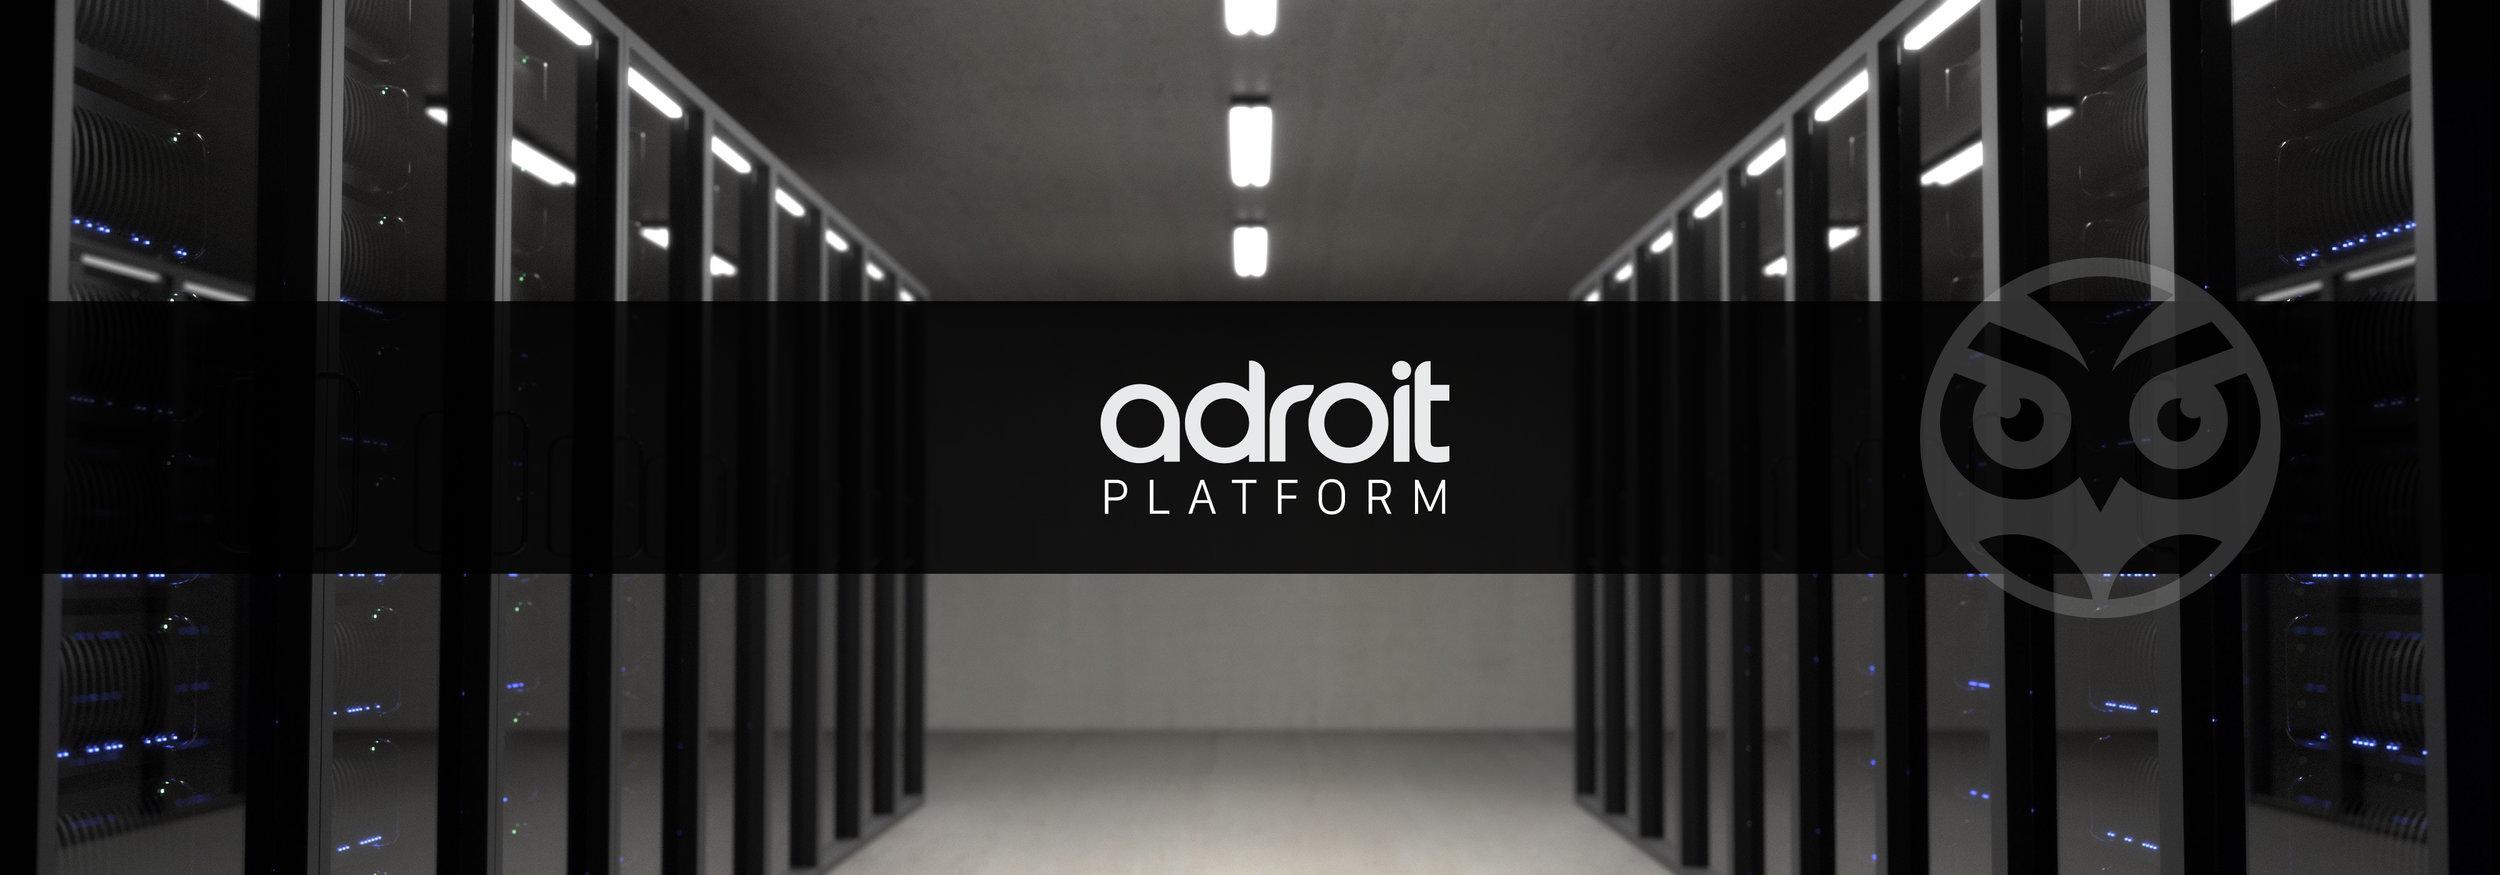 Adroit Platform.jpg